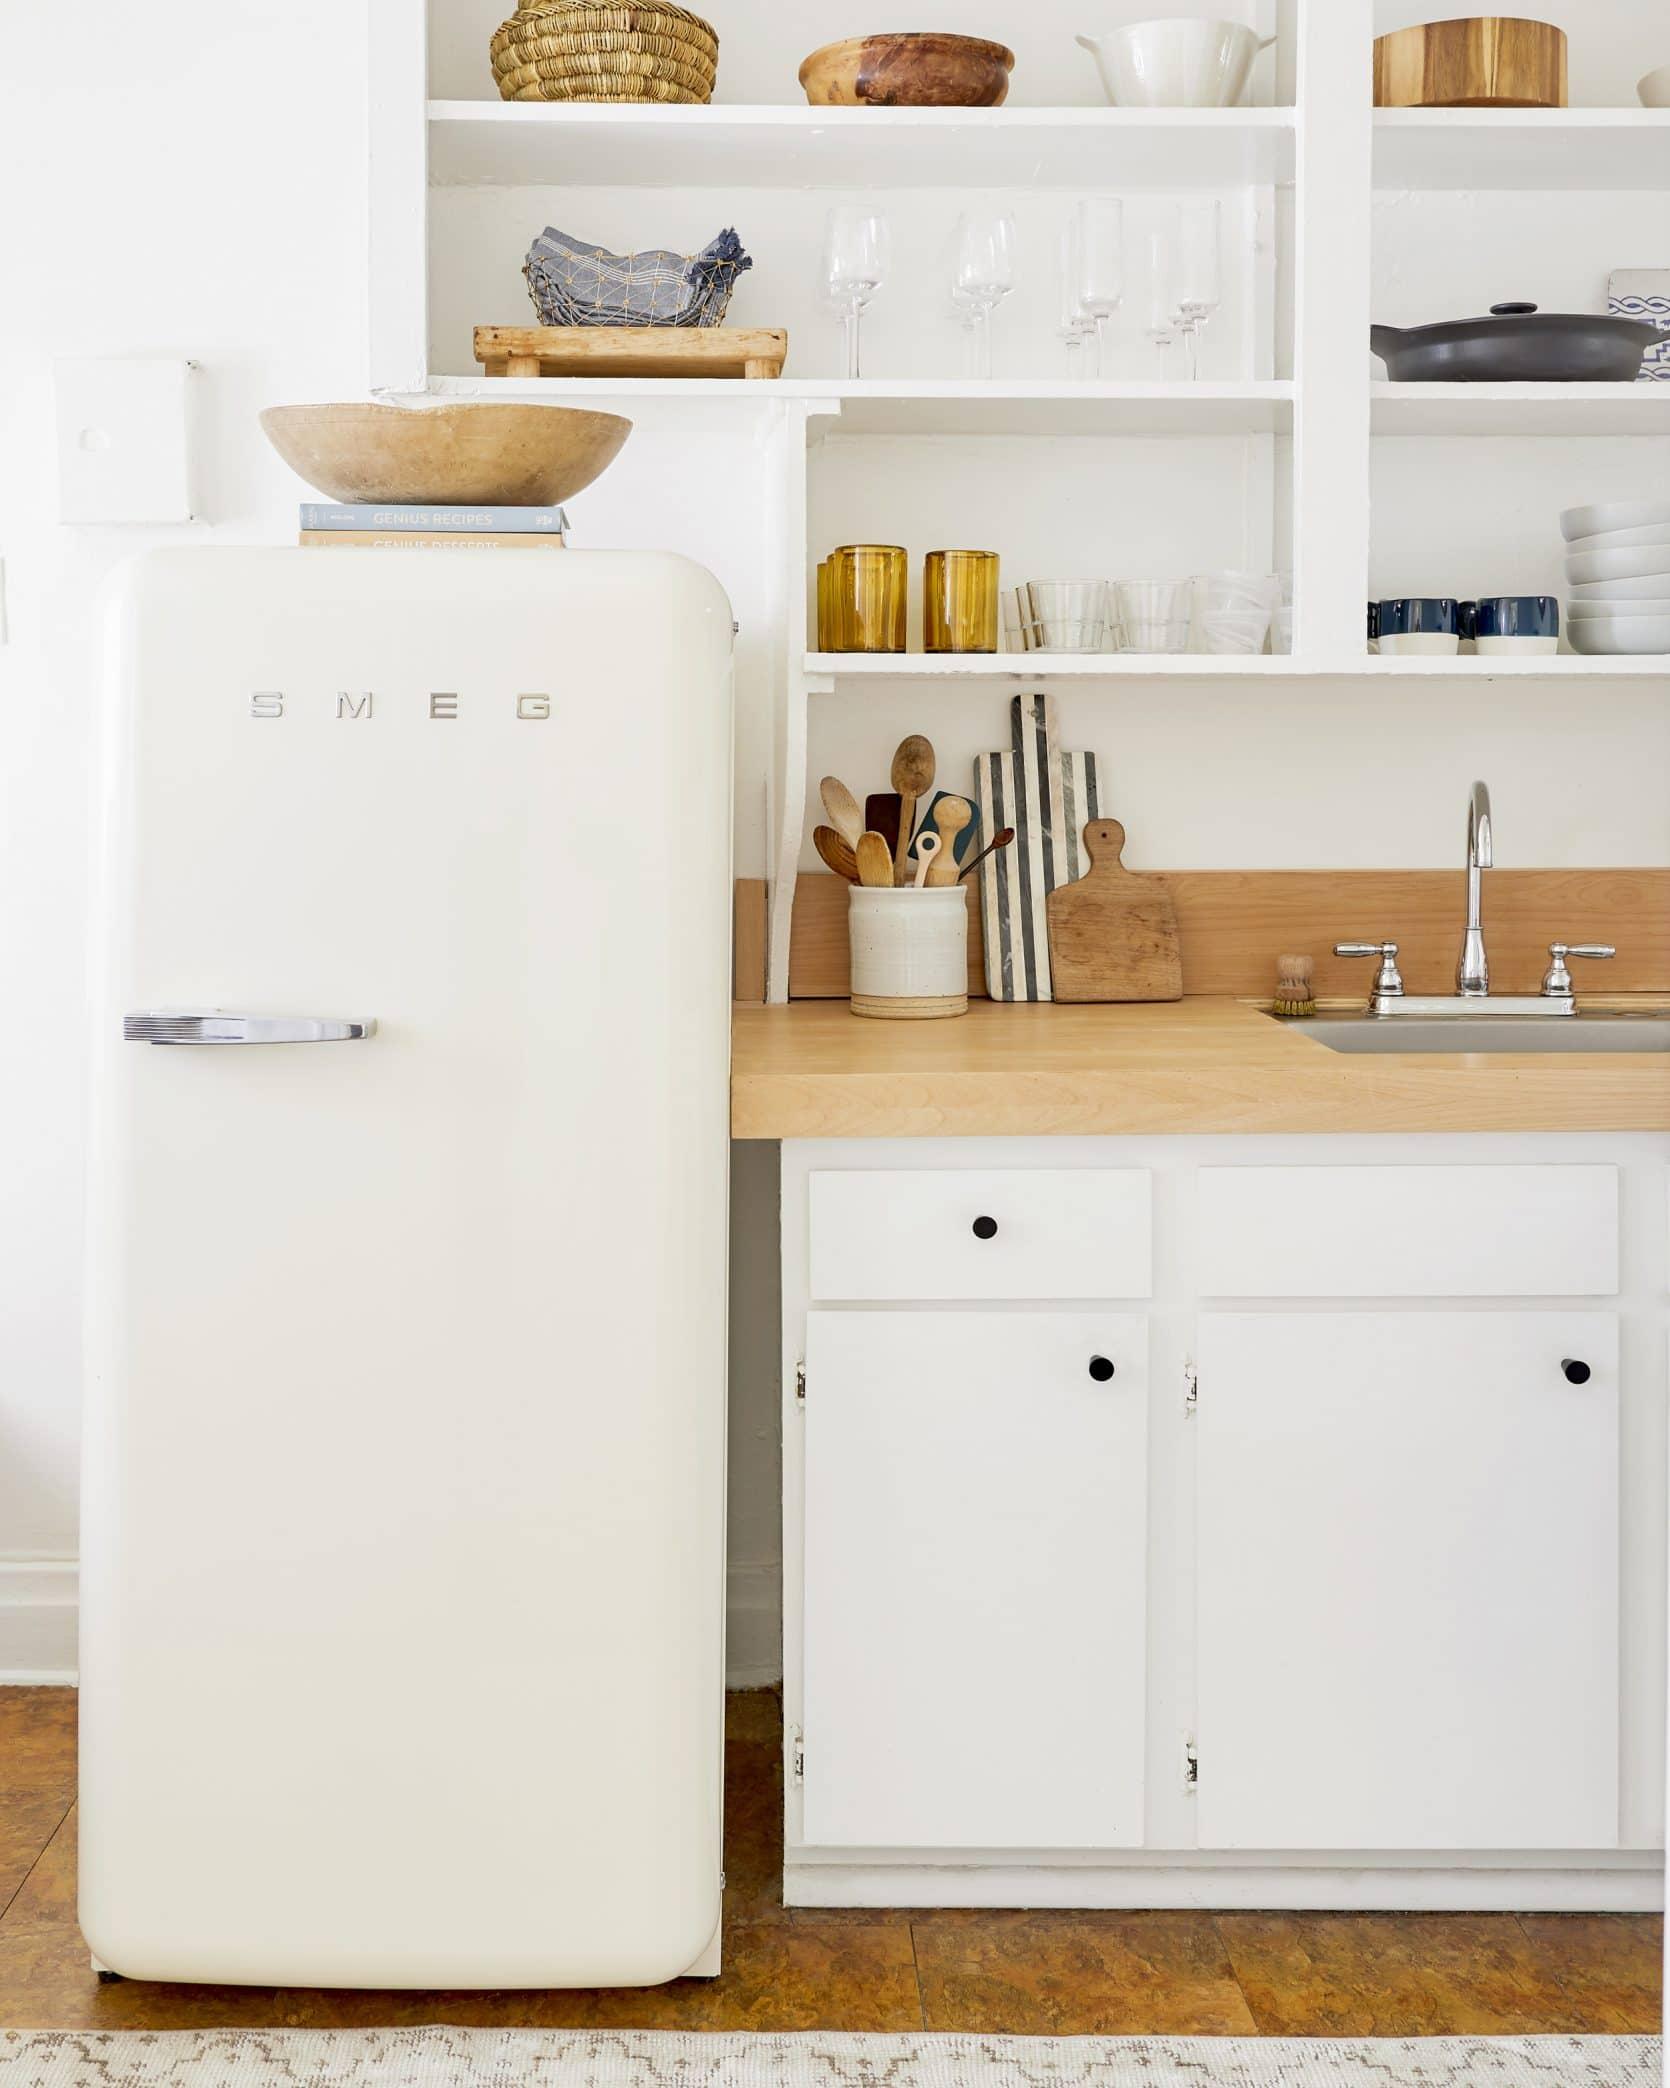 White Smeg kitchen at Emily Henderson.